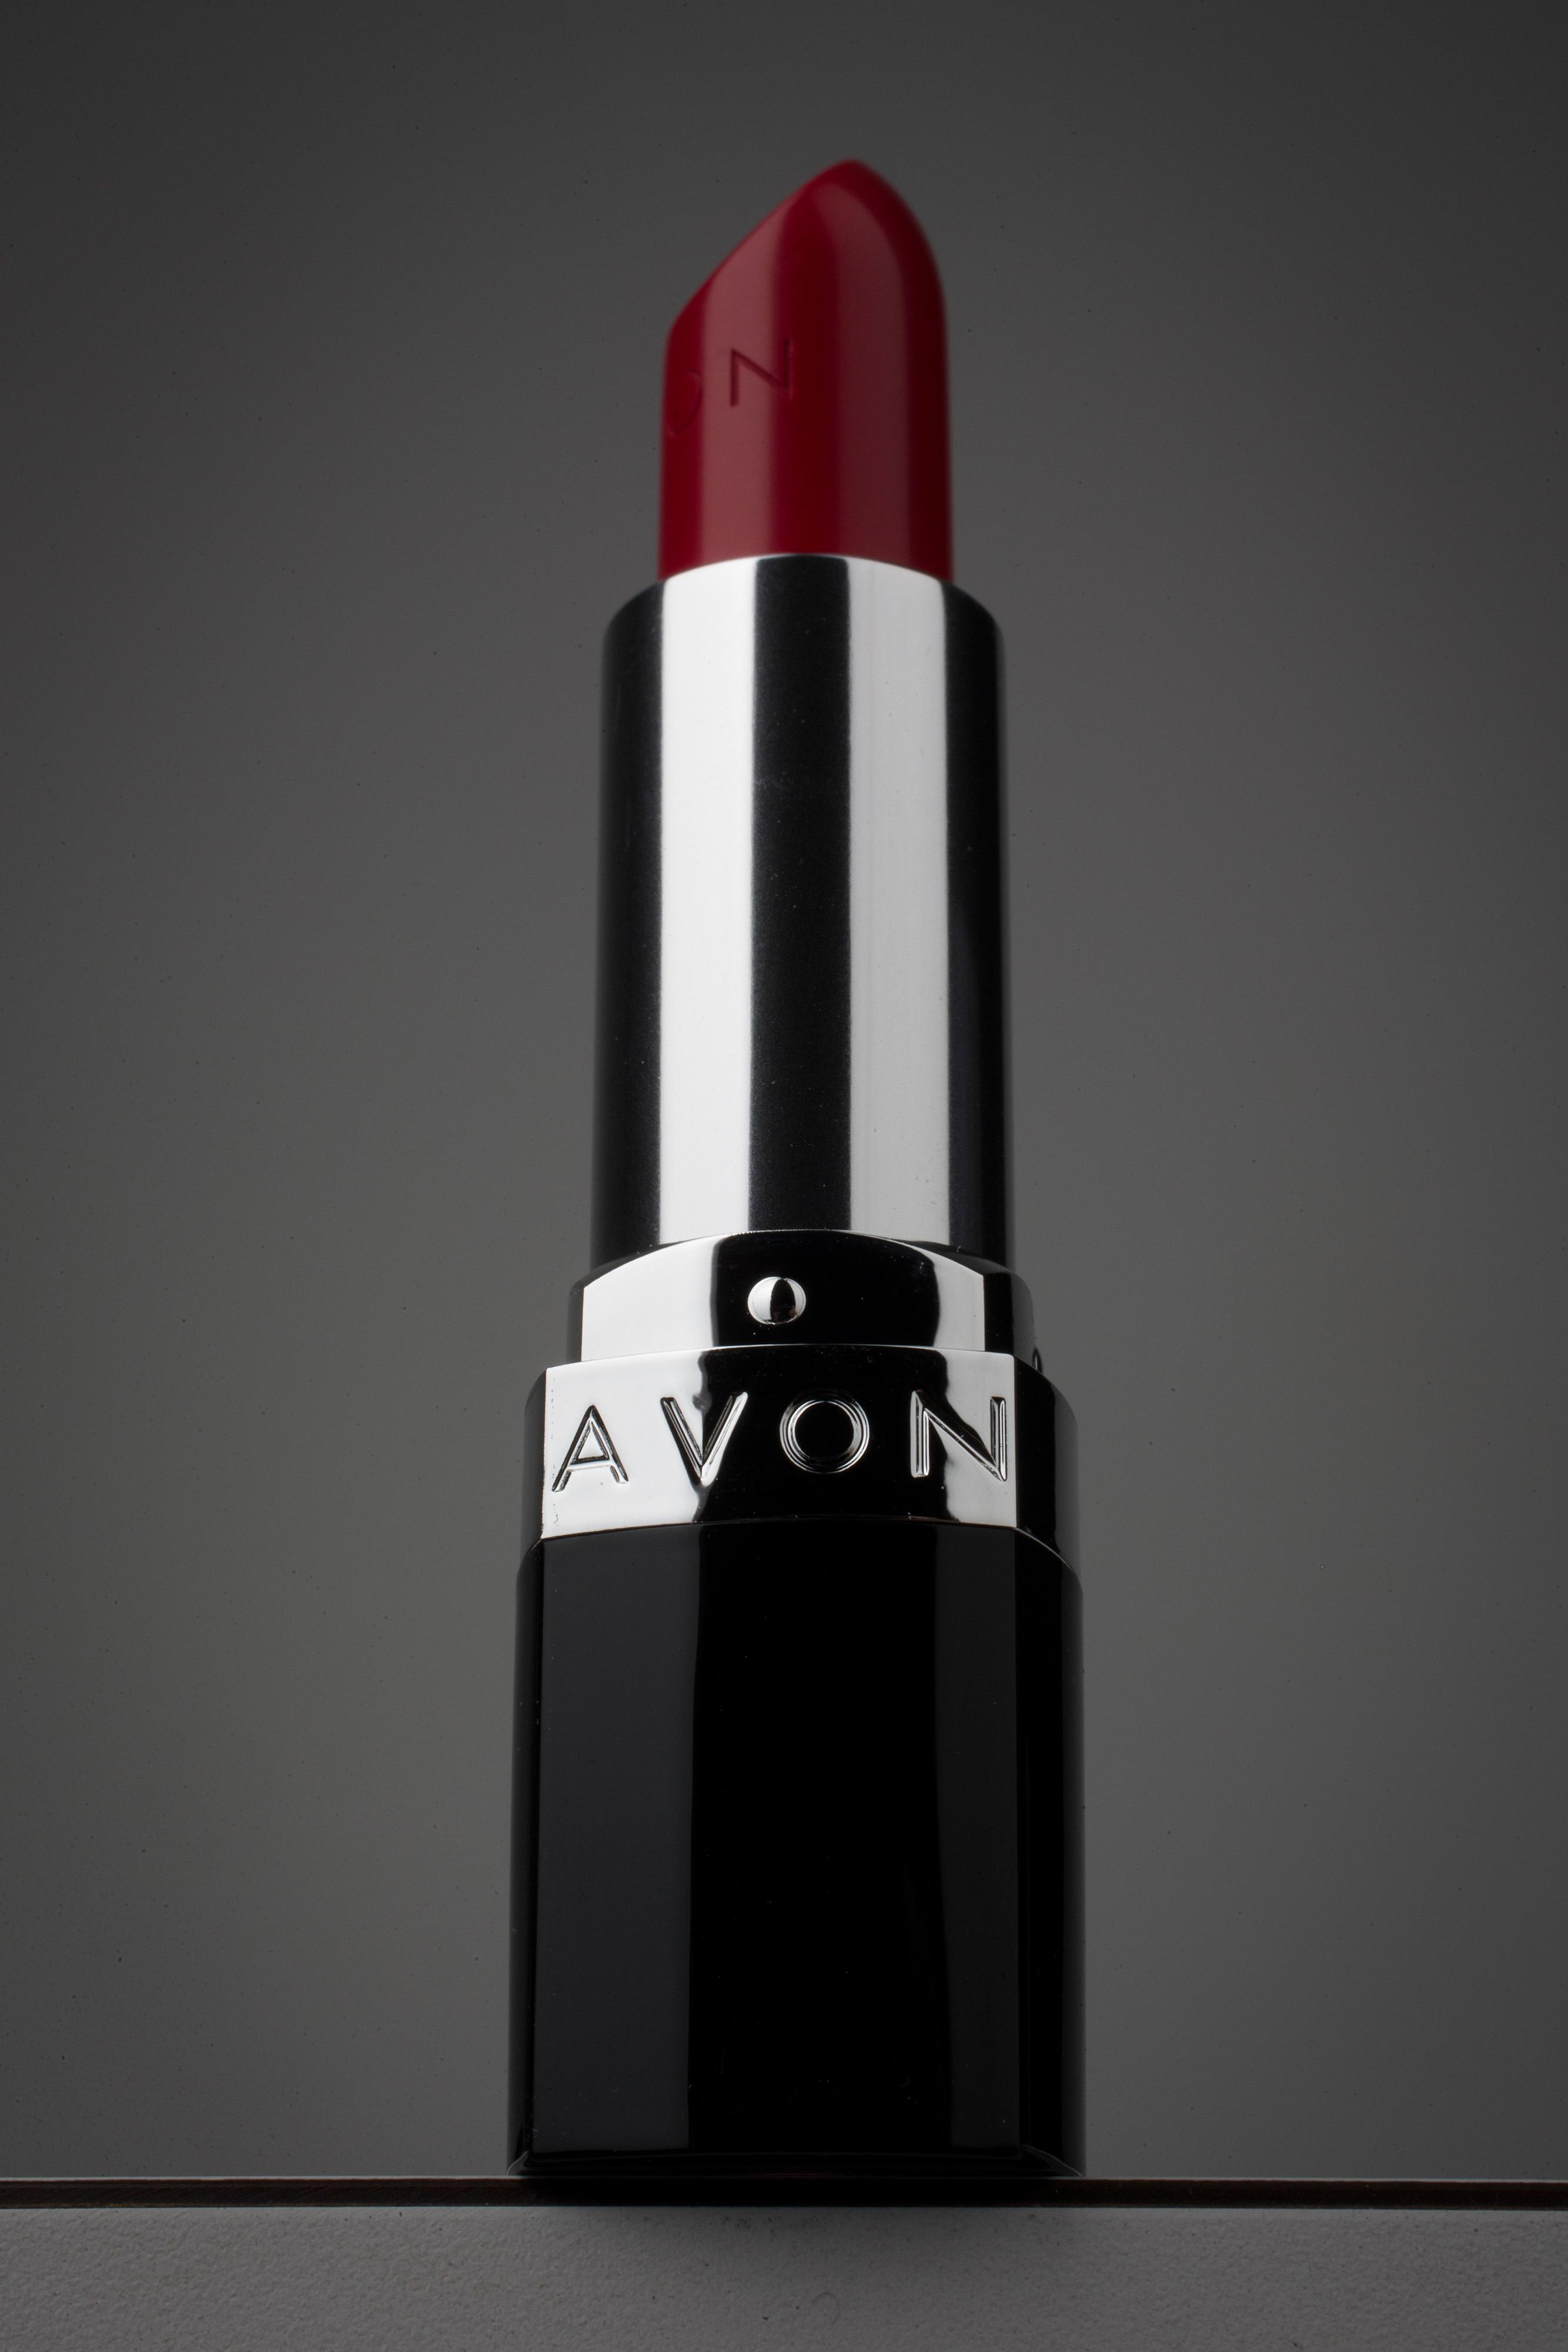 An Avon Products Inc. lipstick.